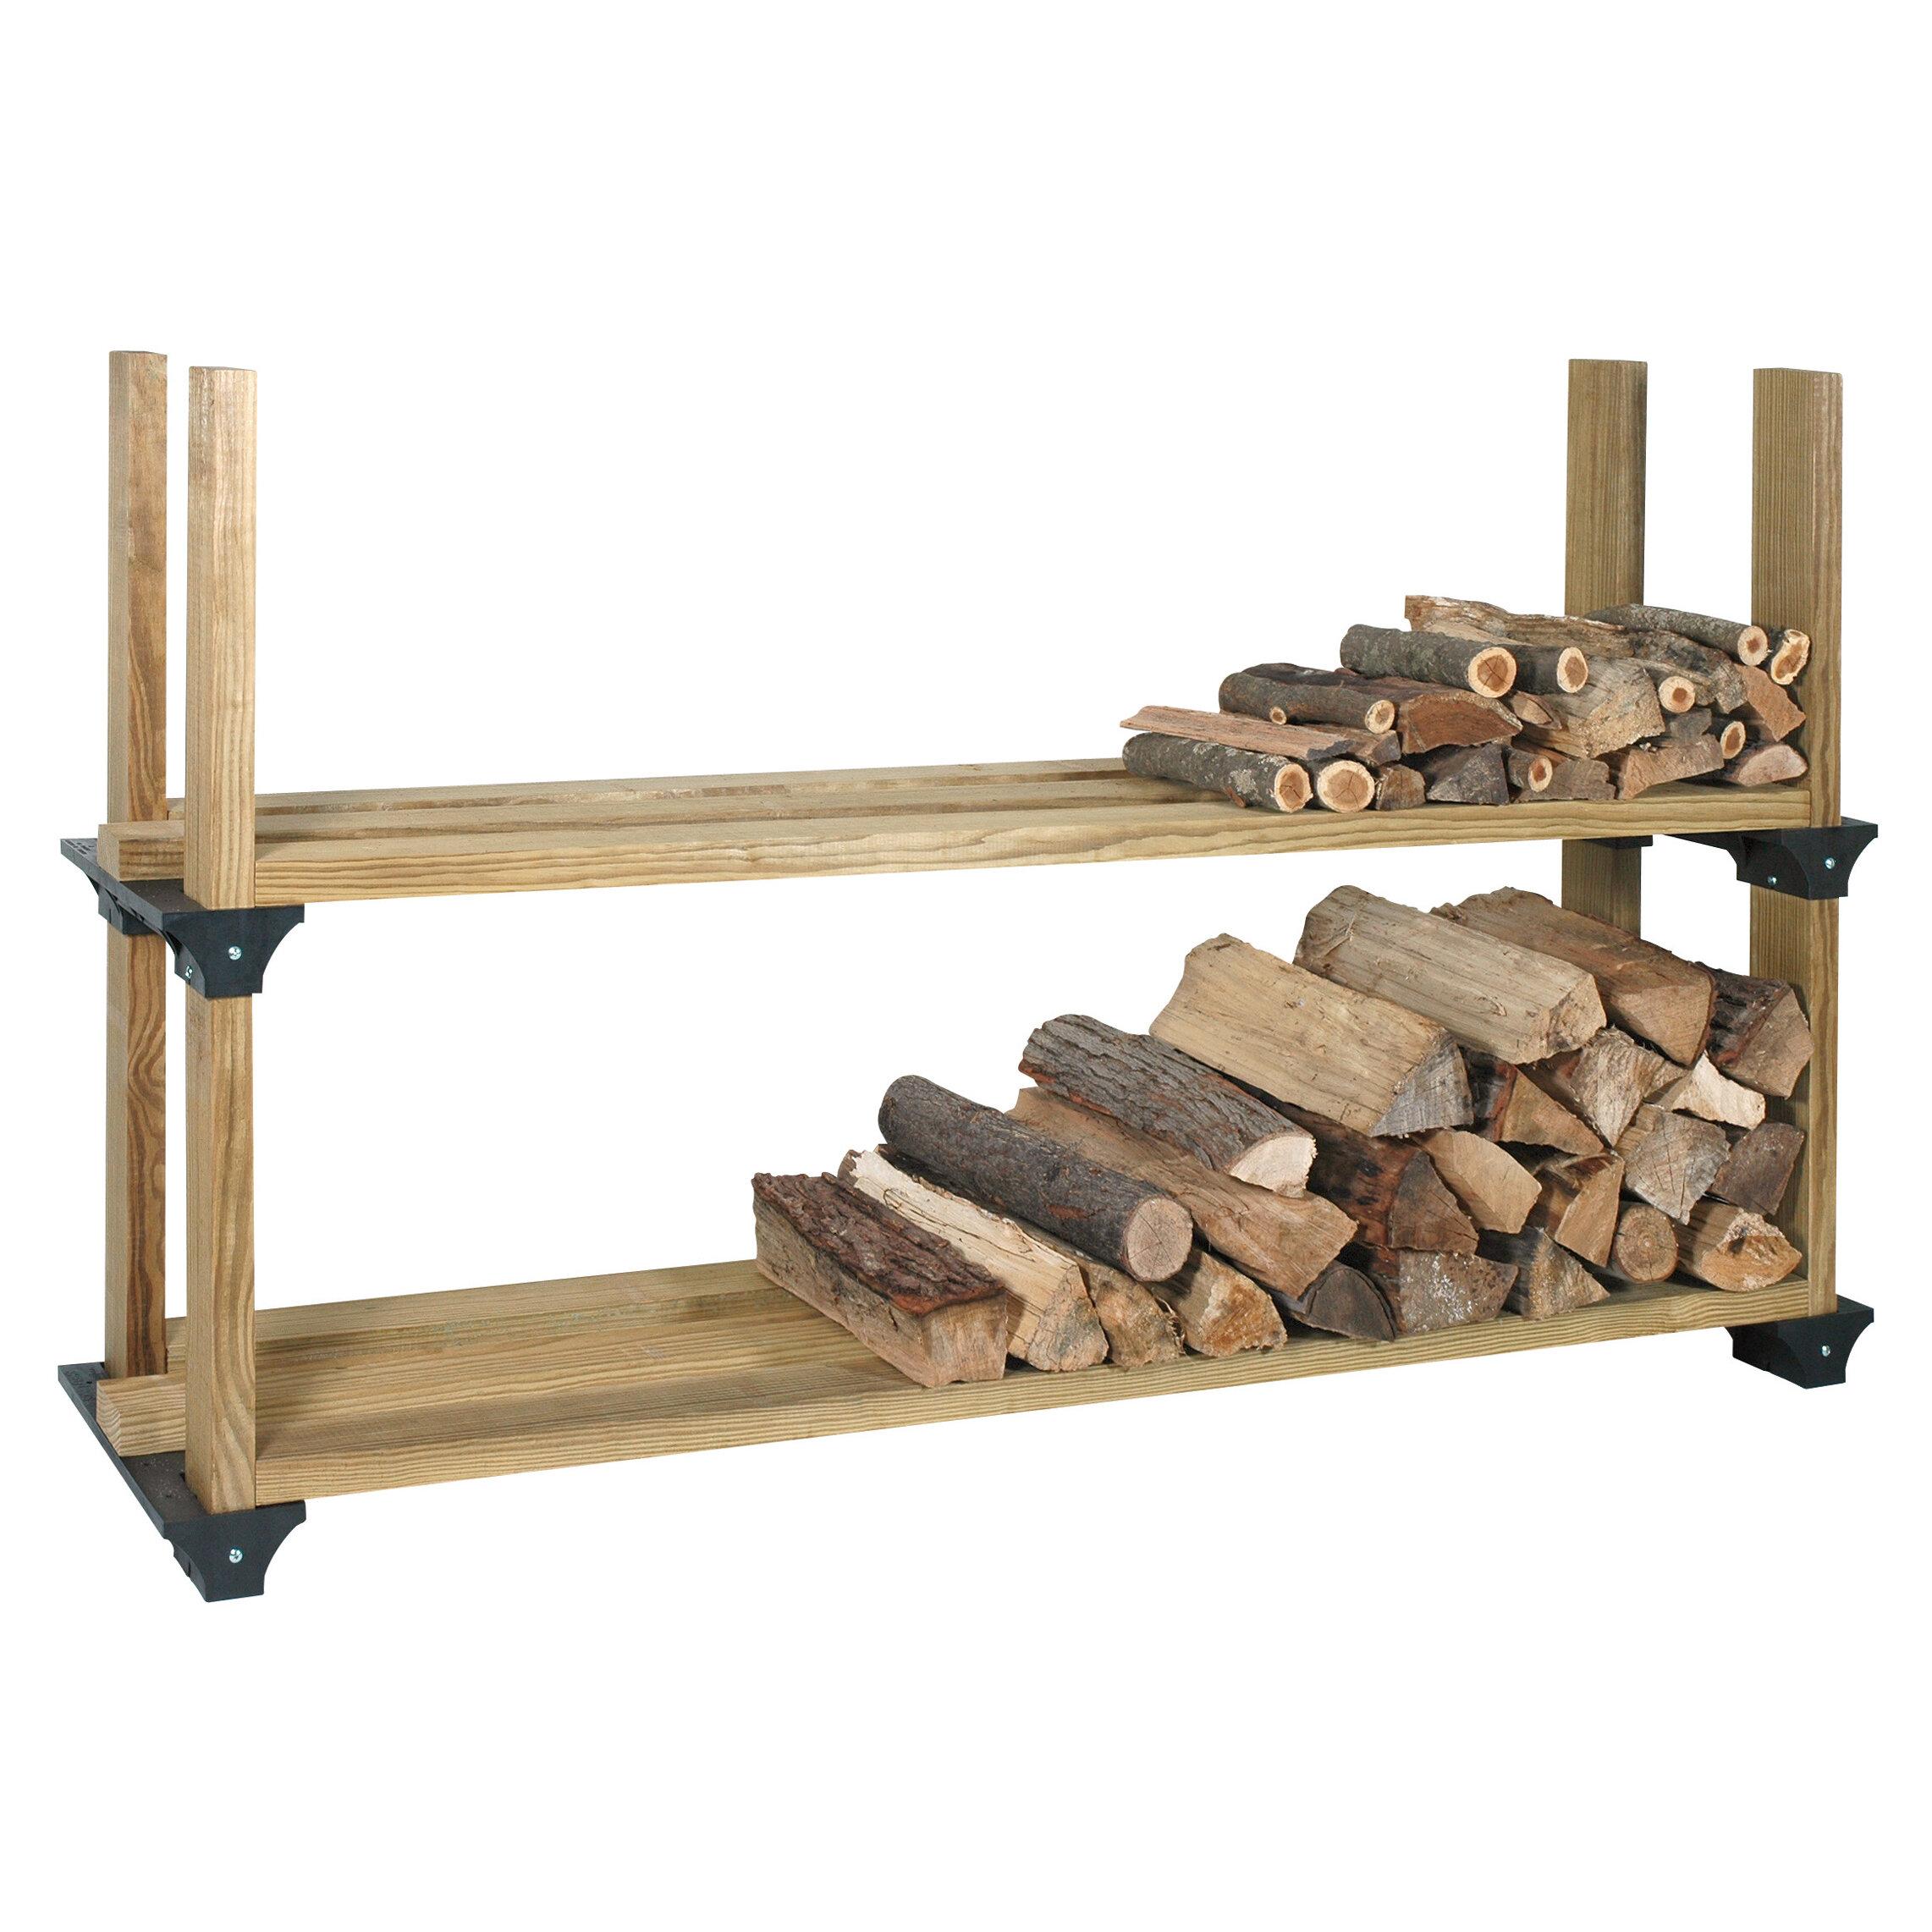 Arlmont Co Kanter Log Rack Reviews Wayfair